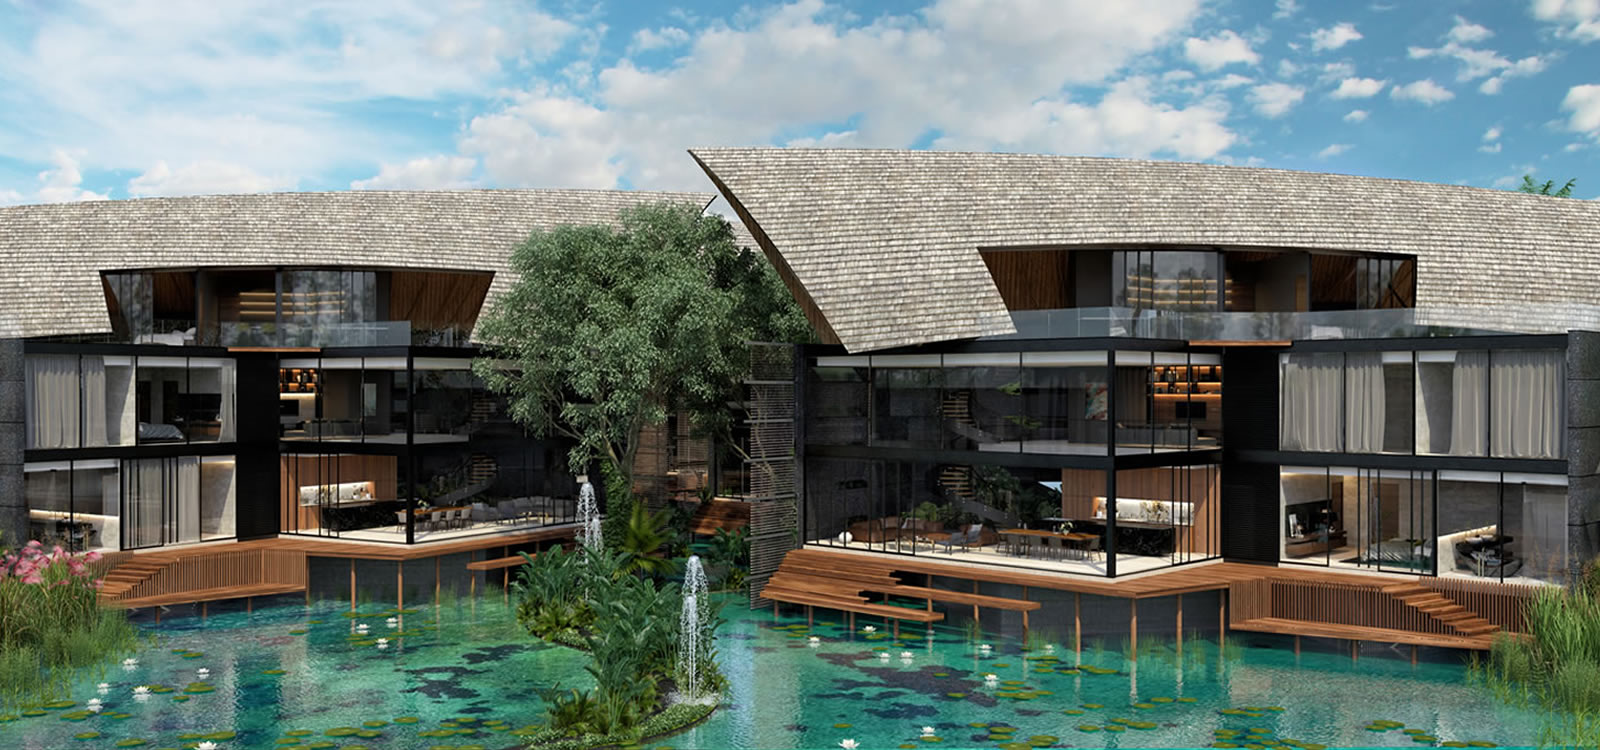 4 bedroom luxury homes for sale puerto canc n mexico - 4 bedroom homes for sale in atlanta georgia ...